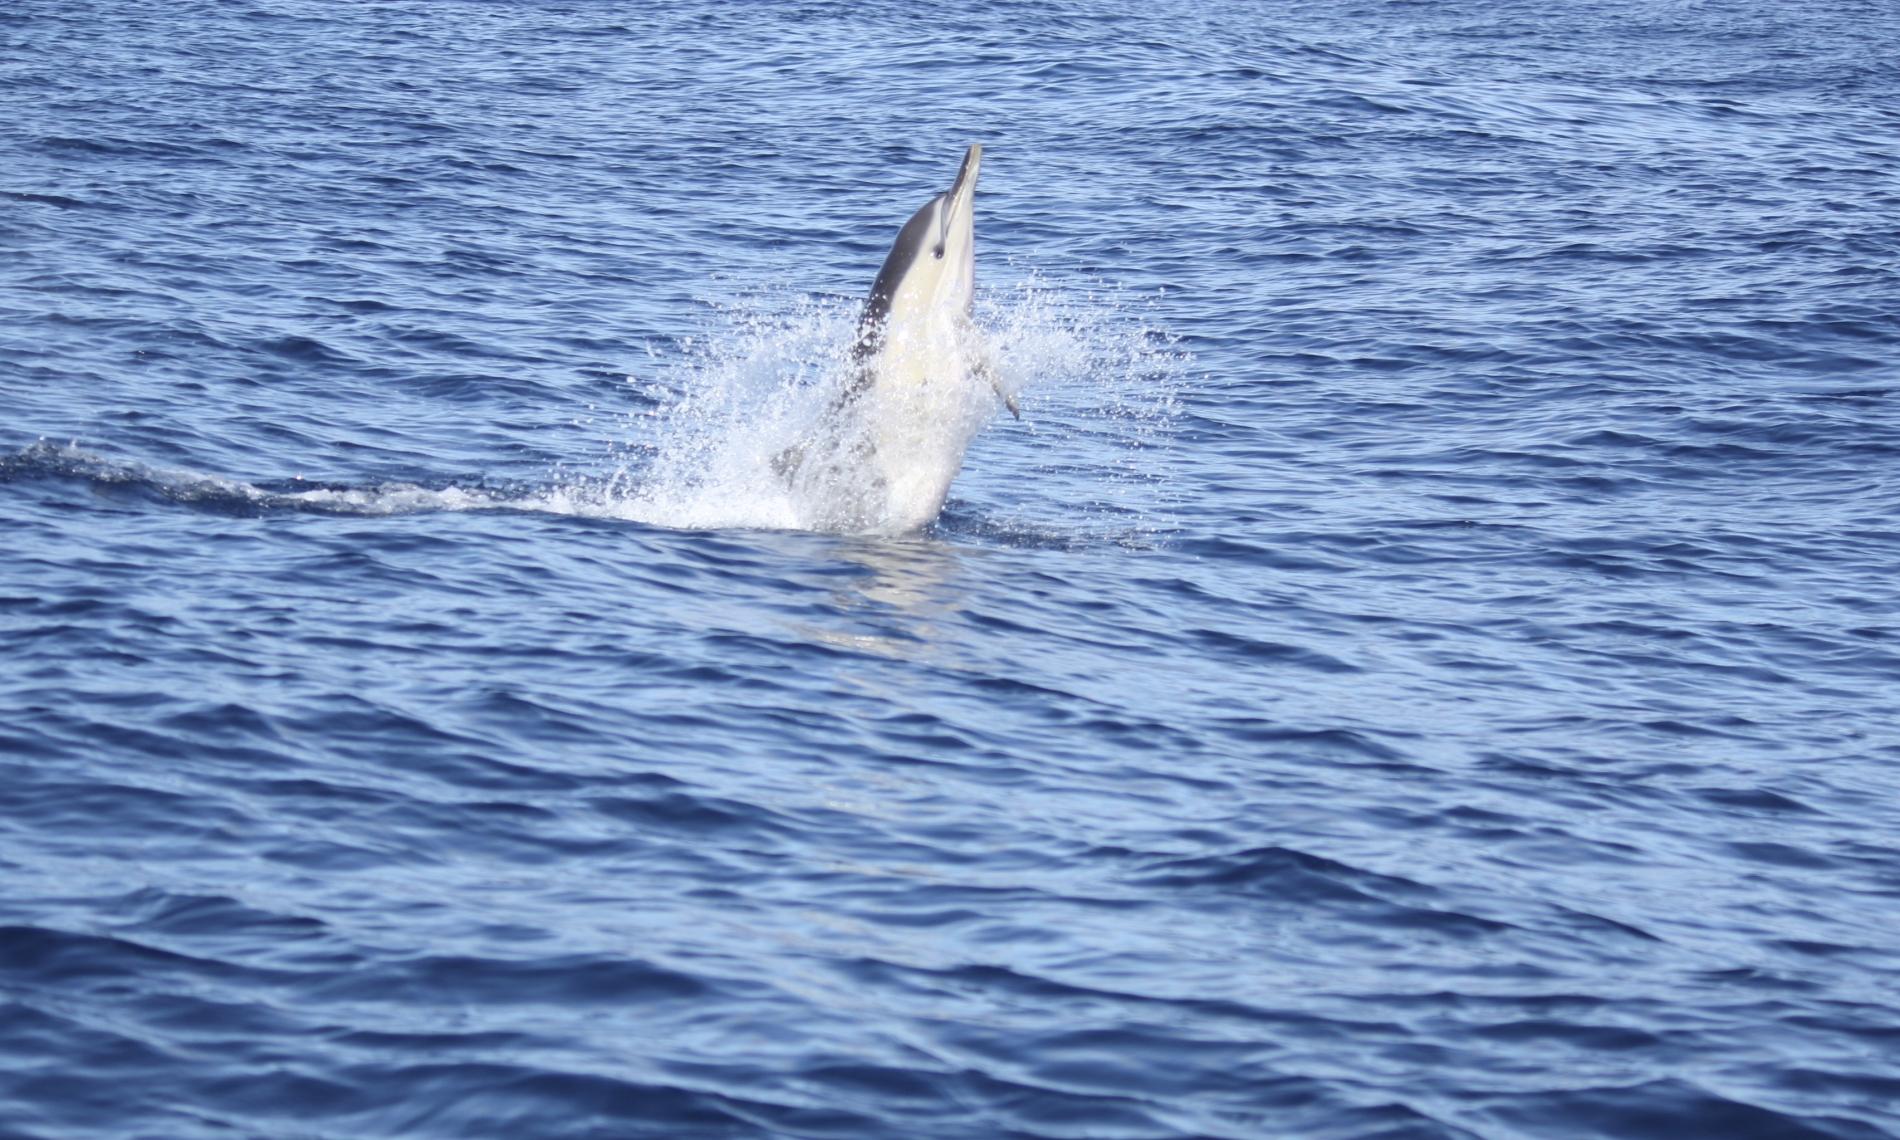 rencontre dauphin espagne